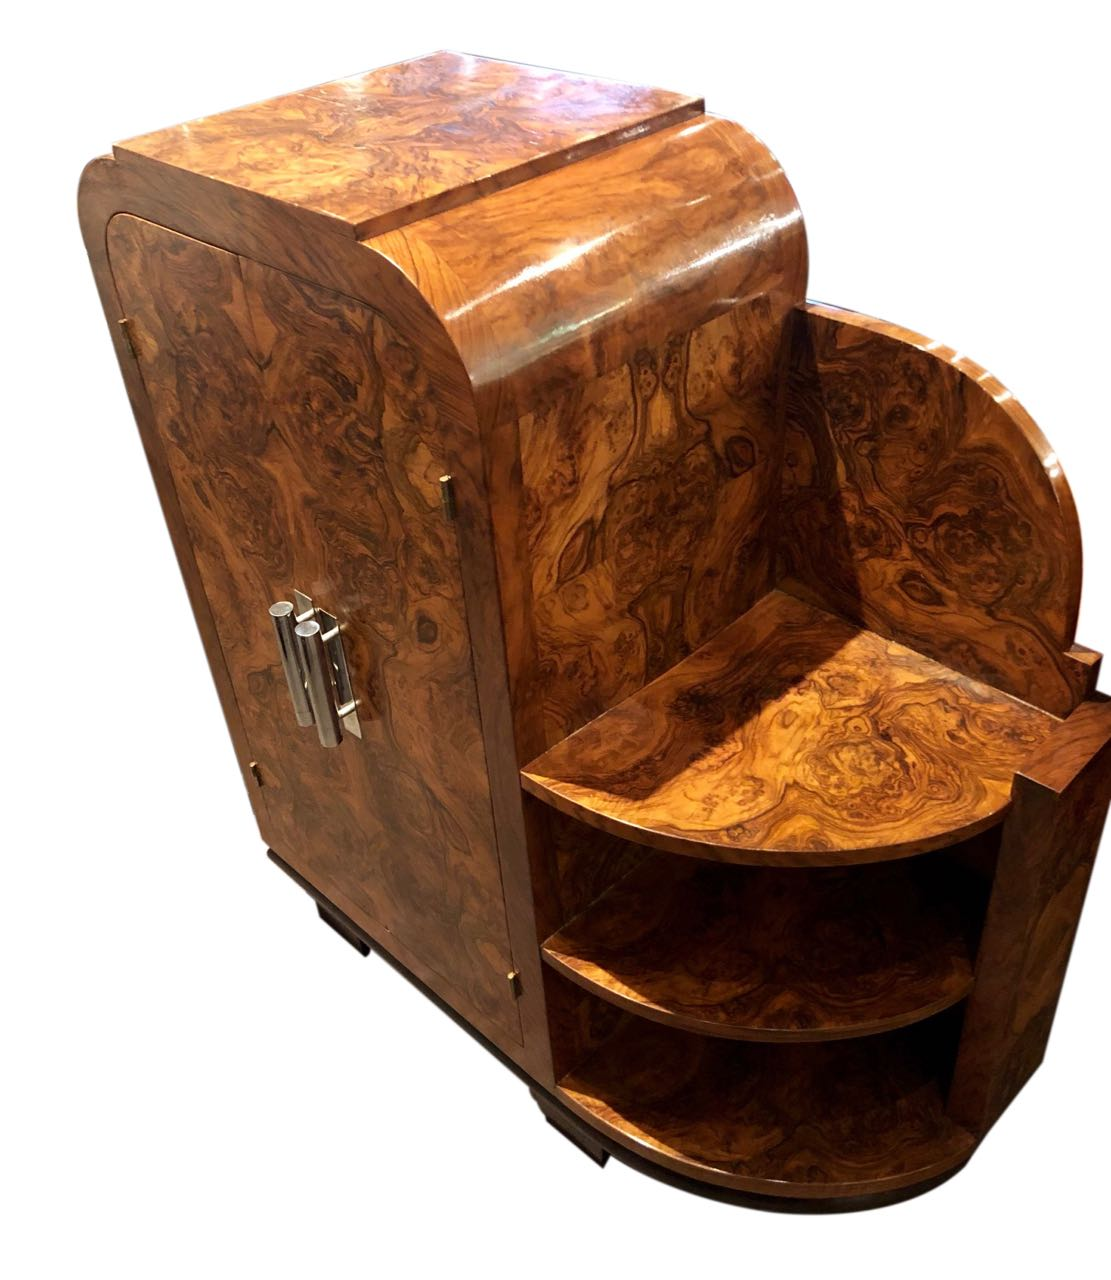 Art Deco Furniture For Sale Desks And Cabinets Art